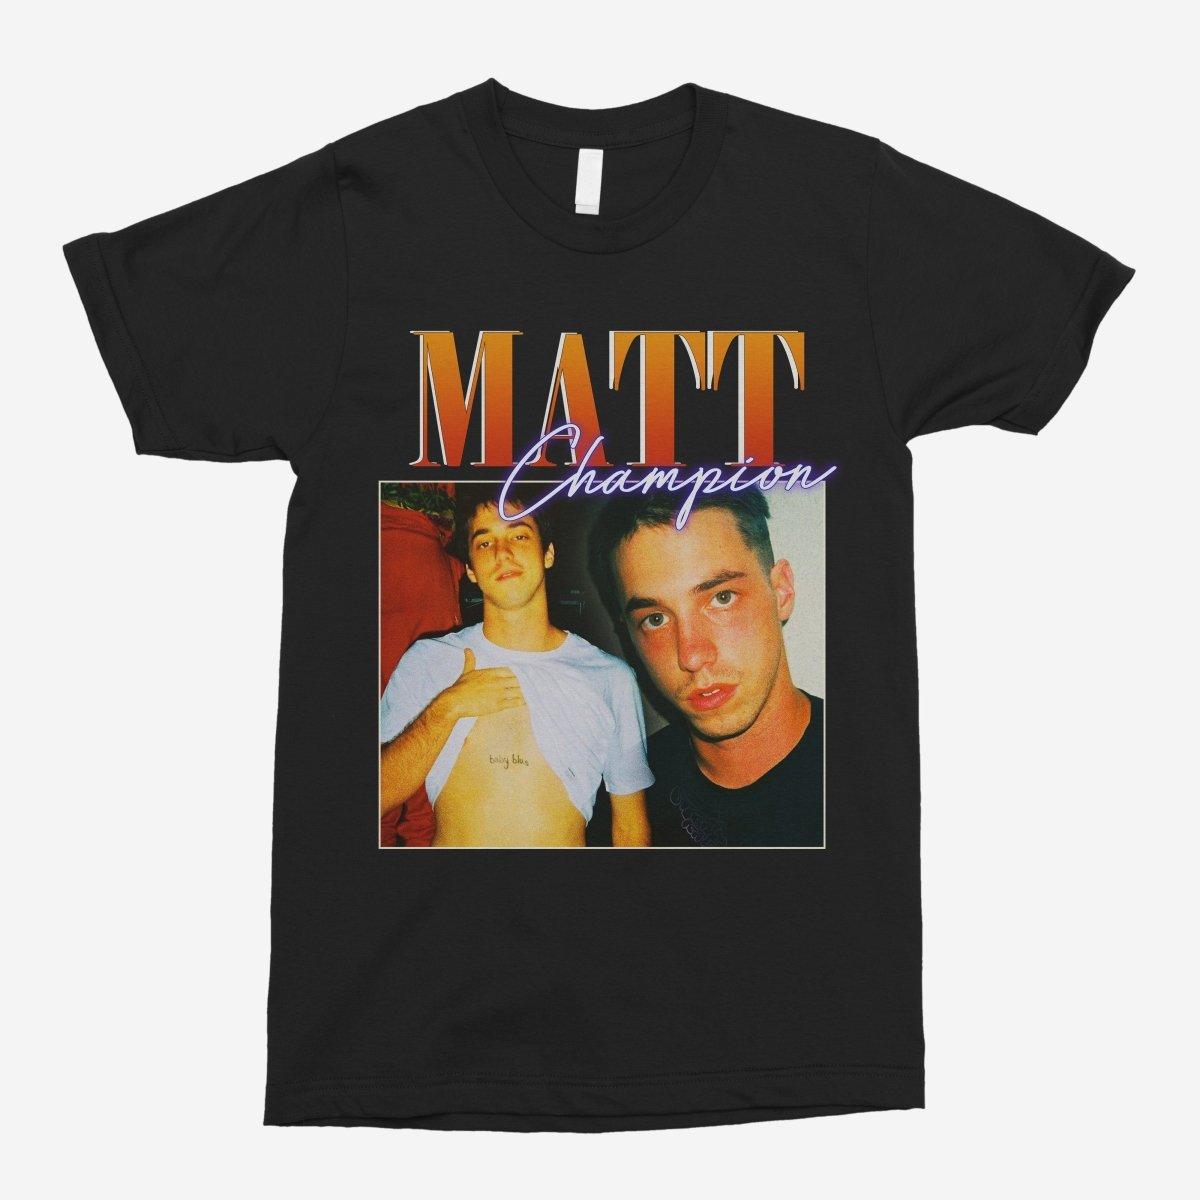 Matt Champion Vintage Unisex T-Shirt